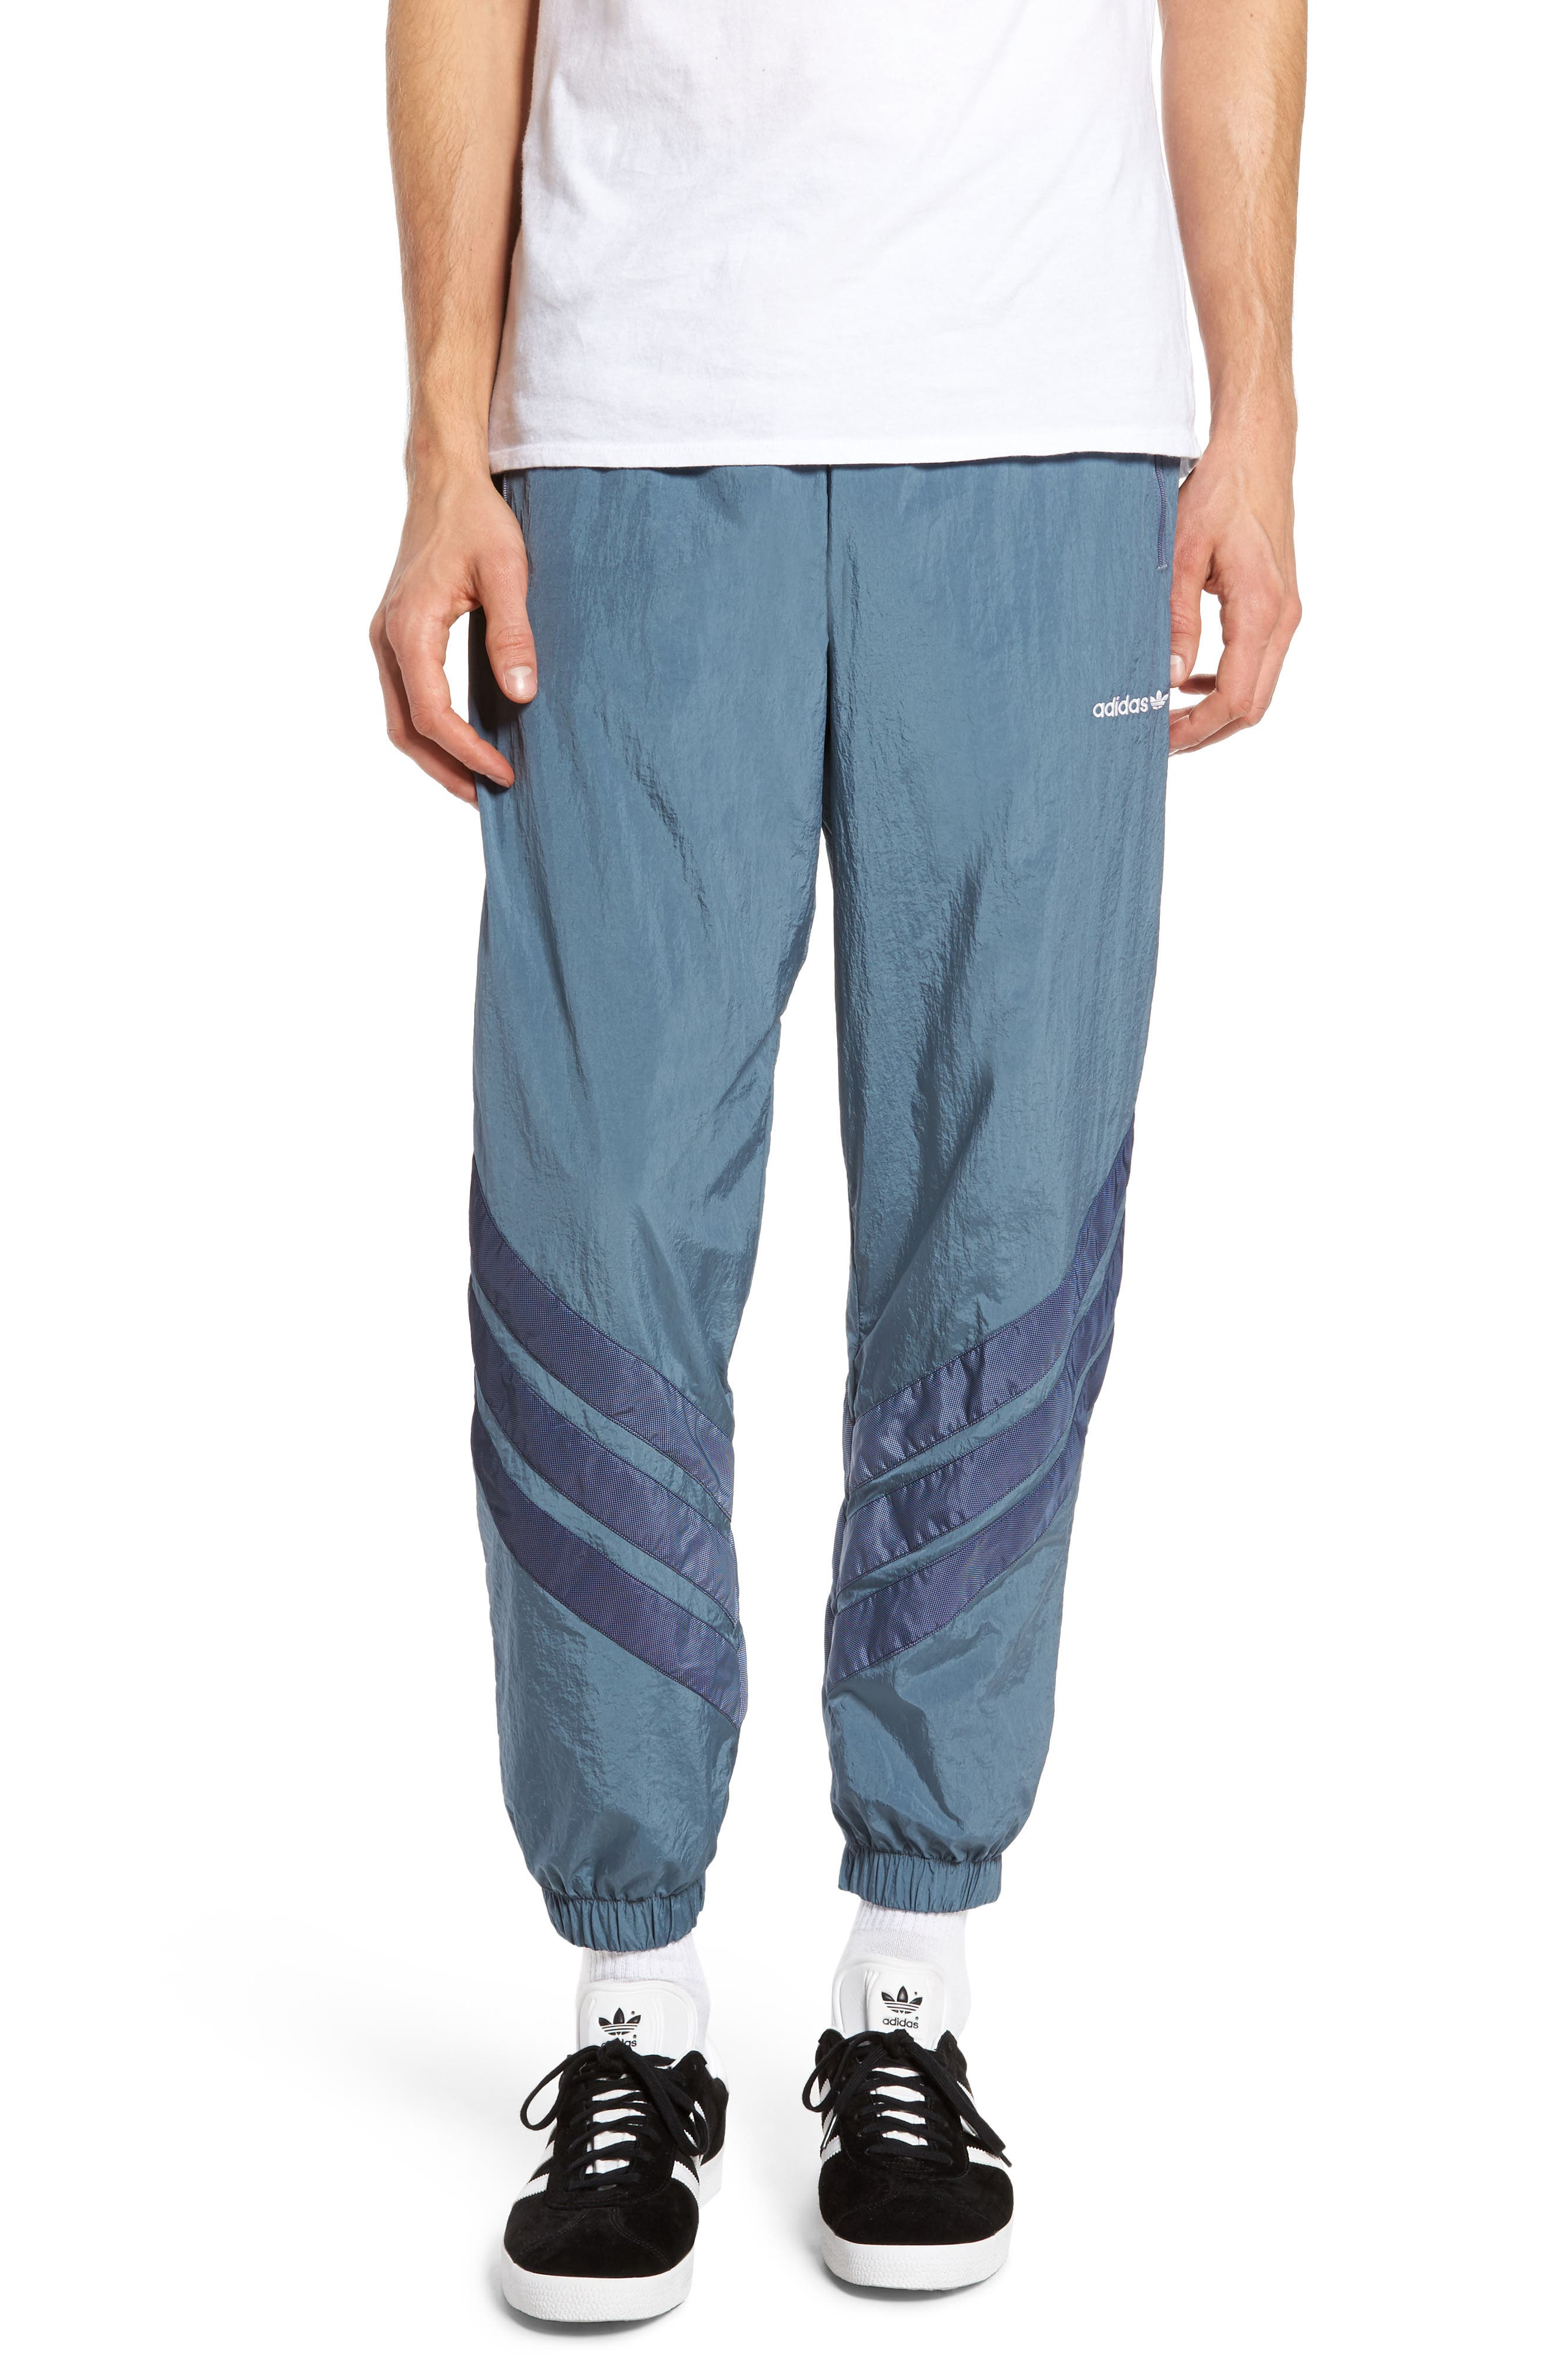 Originals V-Stripe Windpants,                             Main thumbnail 1, color,                             Raw Steel/ White